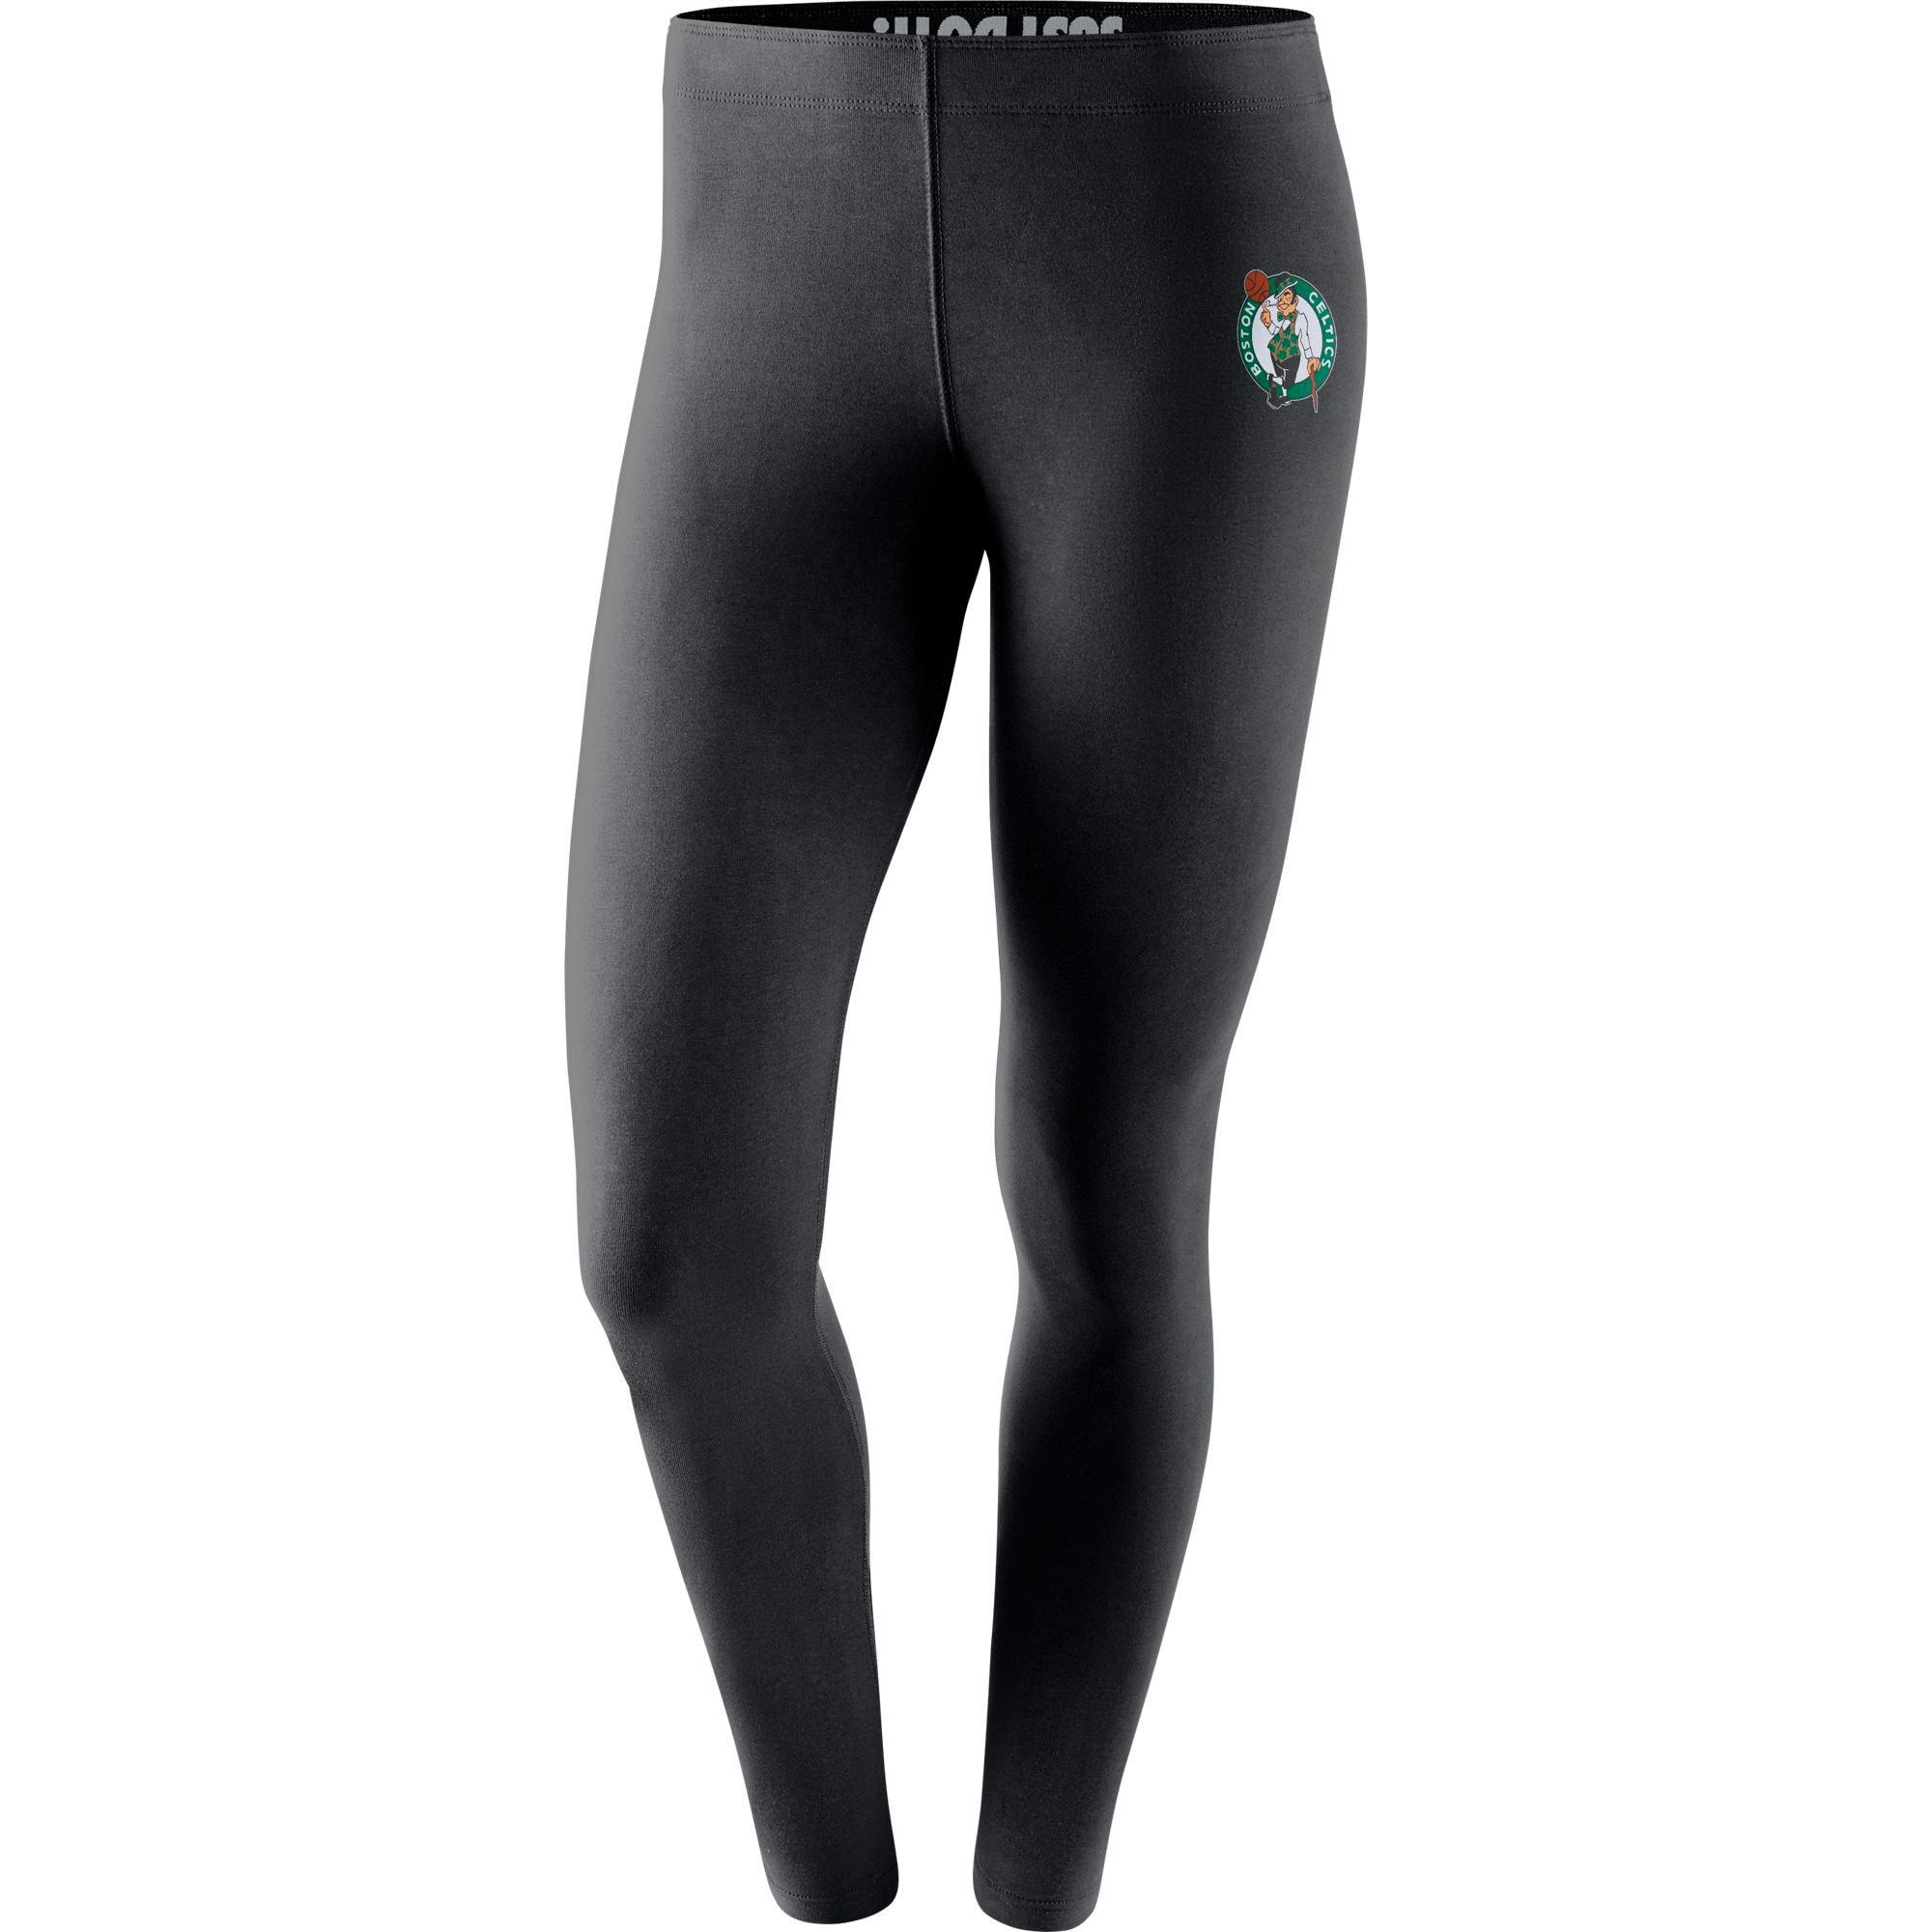 Boston Celtics Nike Women's Leg-A-See Tights - Black